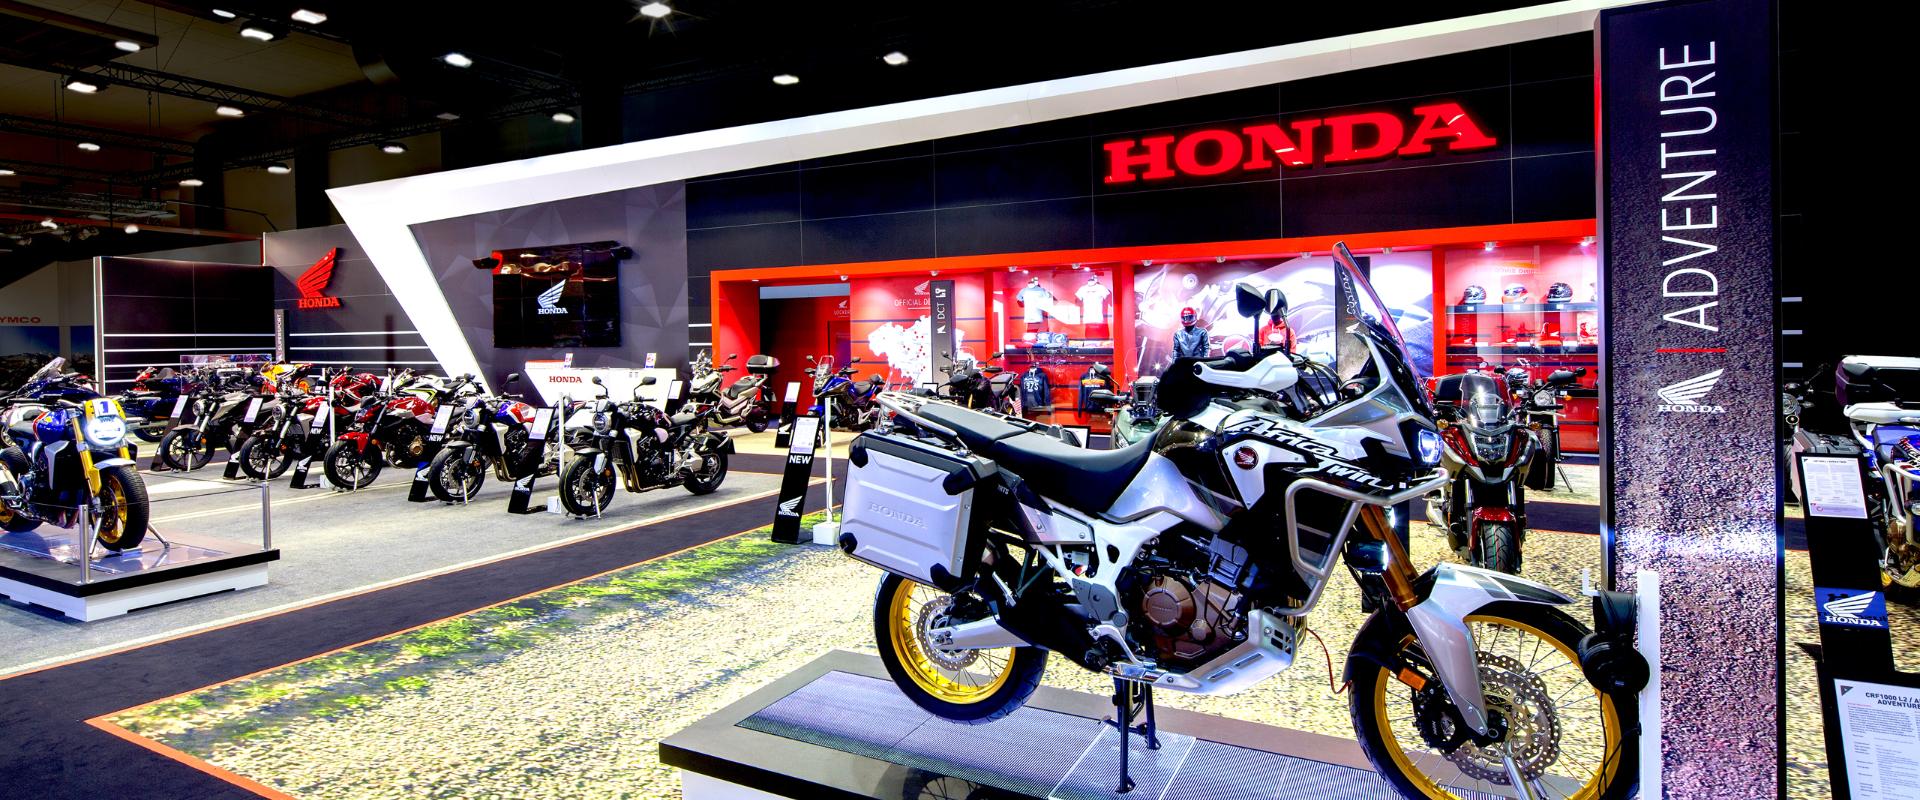 KOPexpo-Honda--AutosalonBrussel2019-Standbouwfotografie-highre3